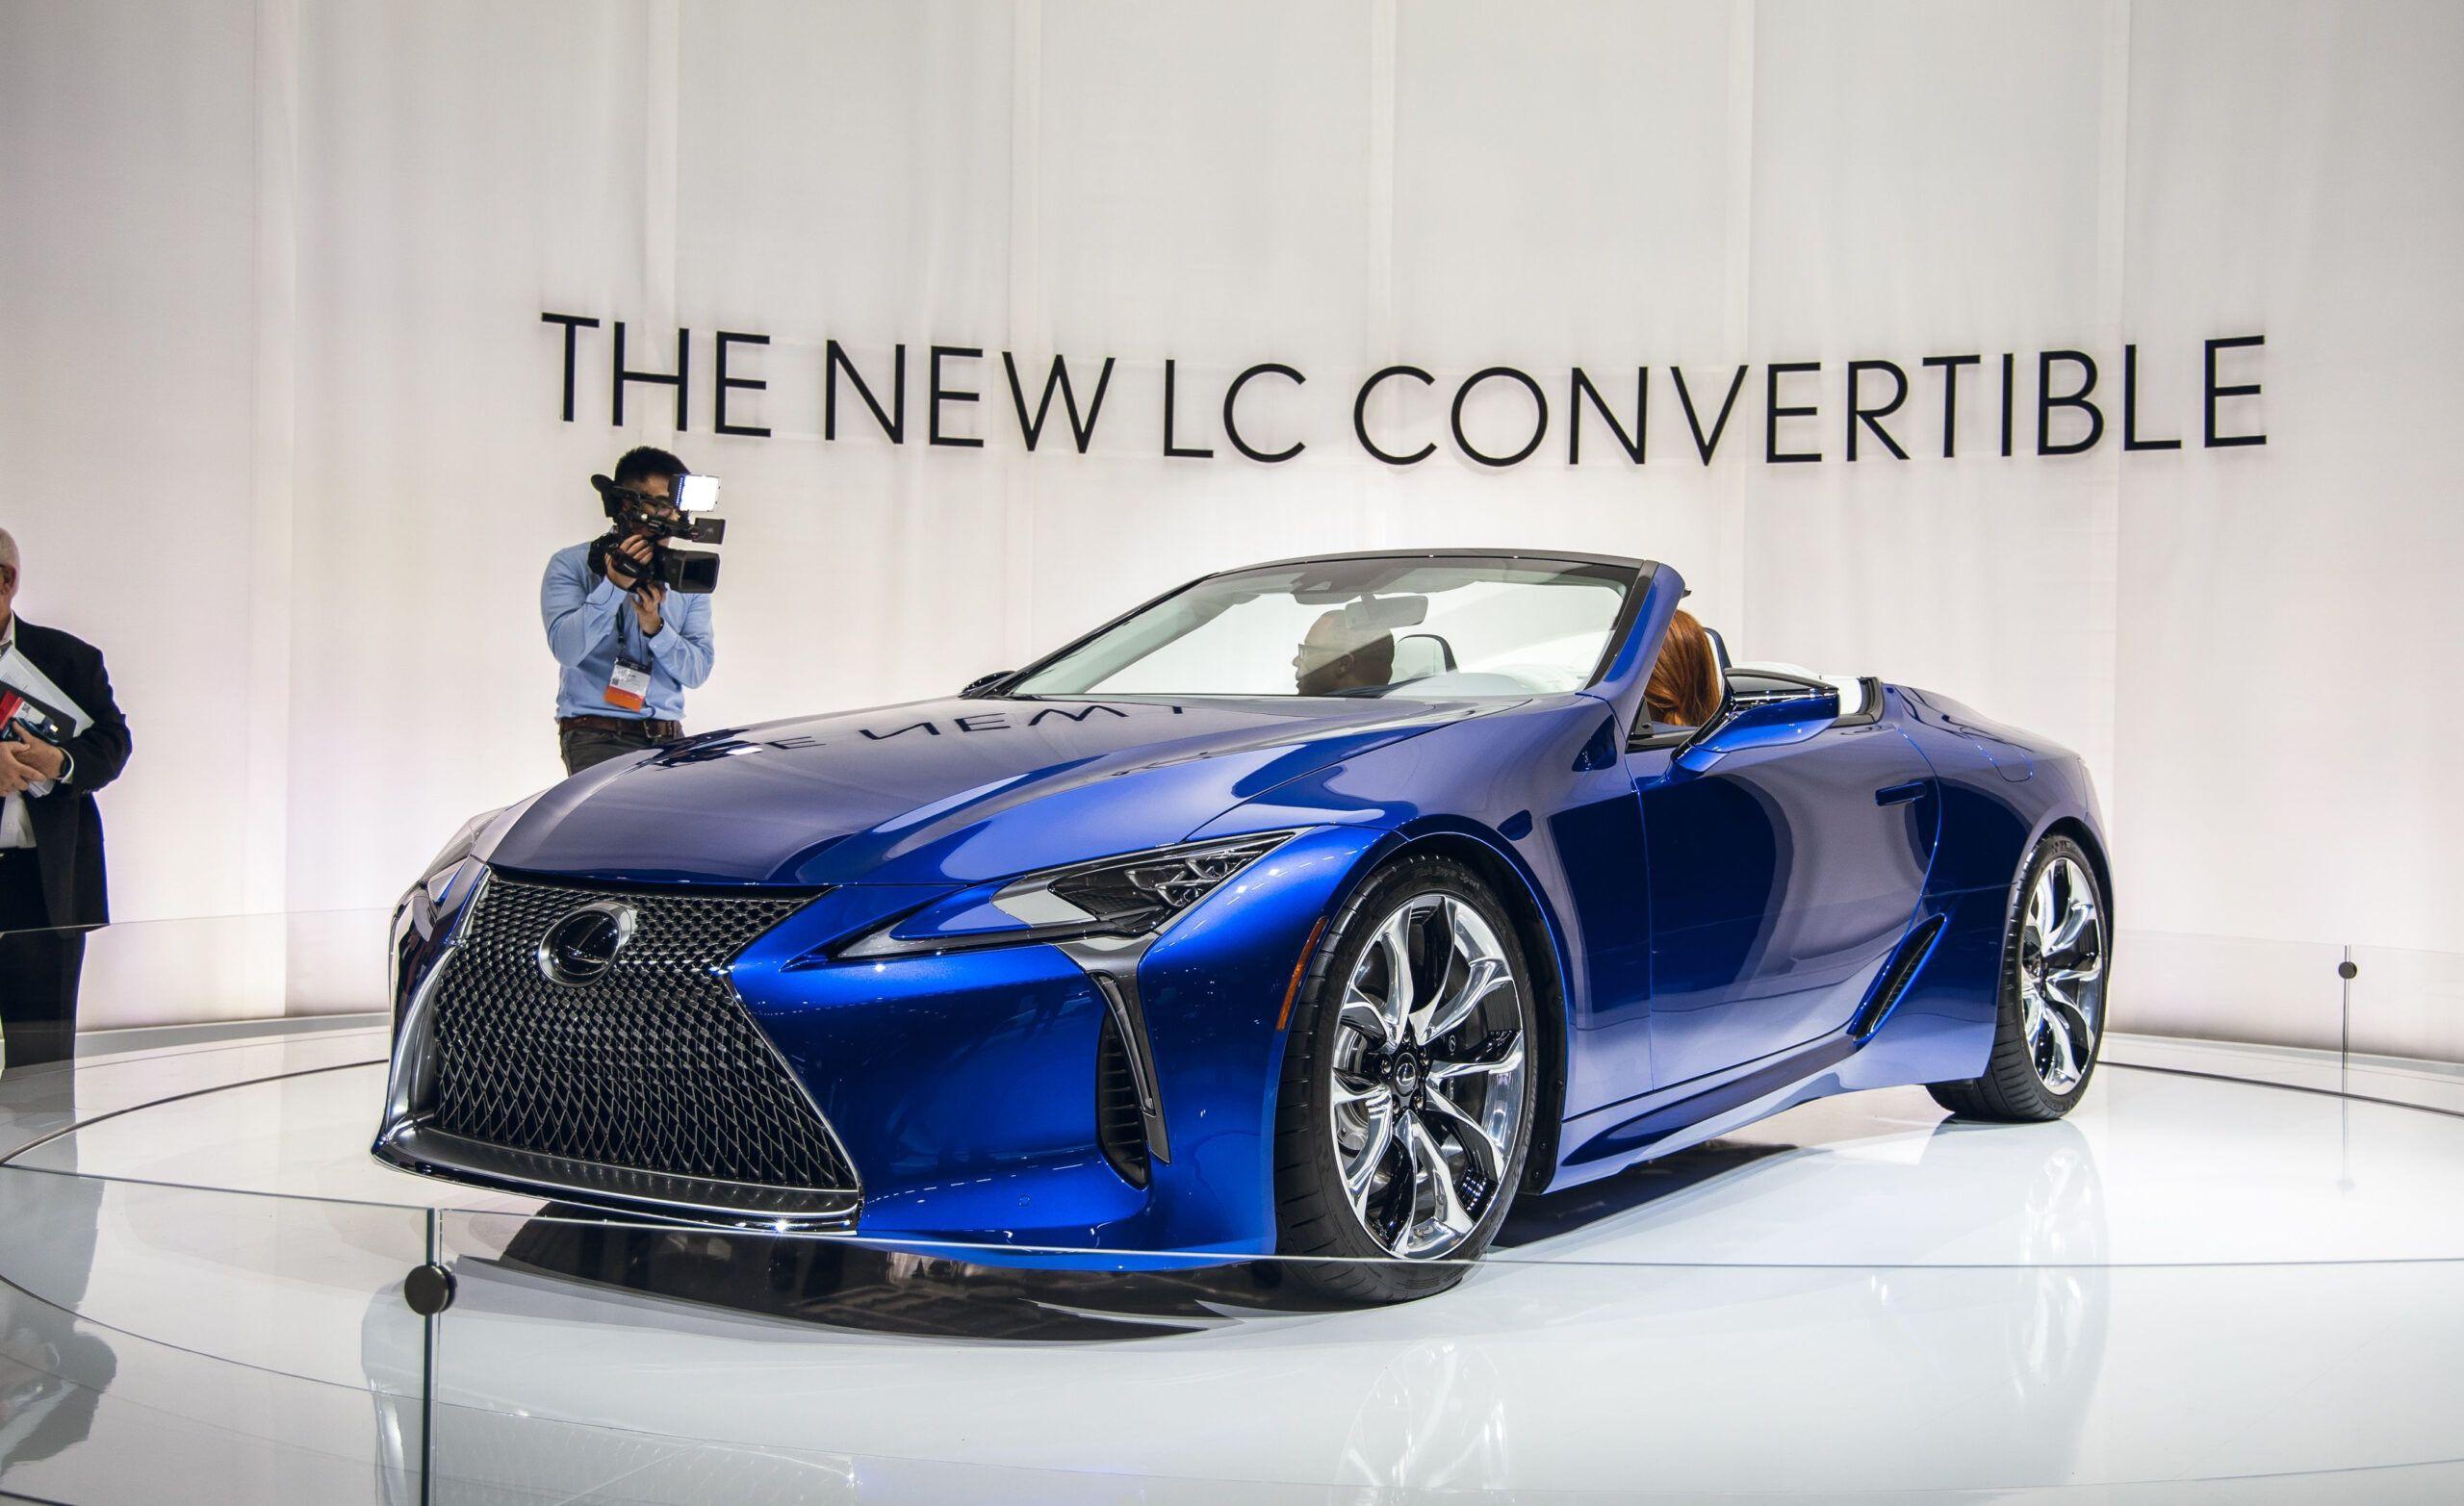 Infiniti Convertible 2021 Specs And Assessment In 2020 Lexus